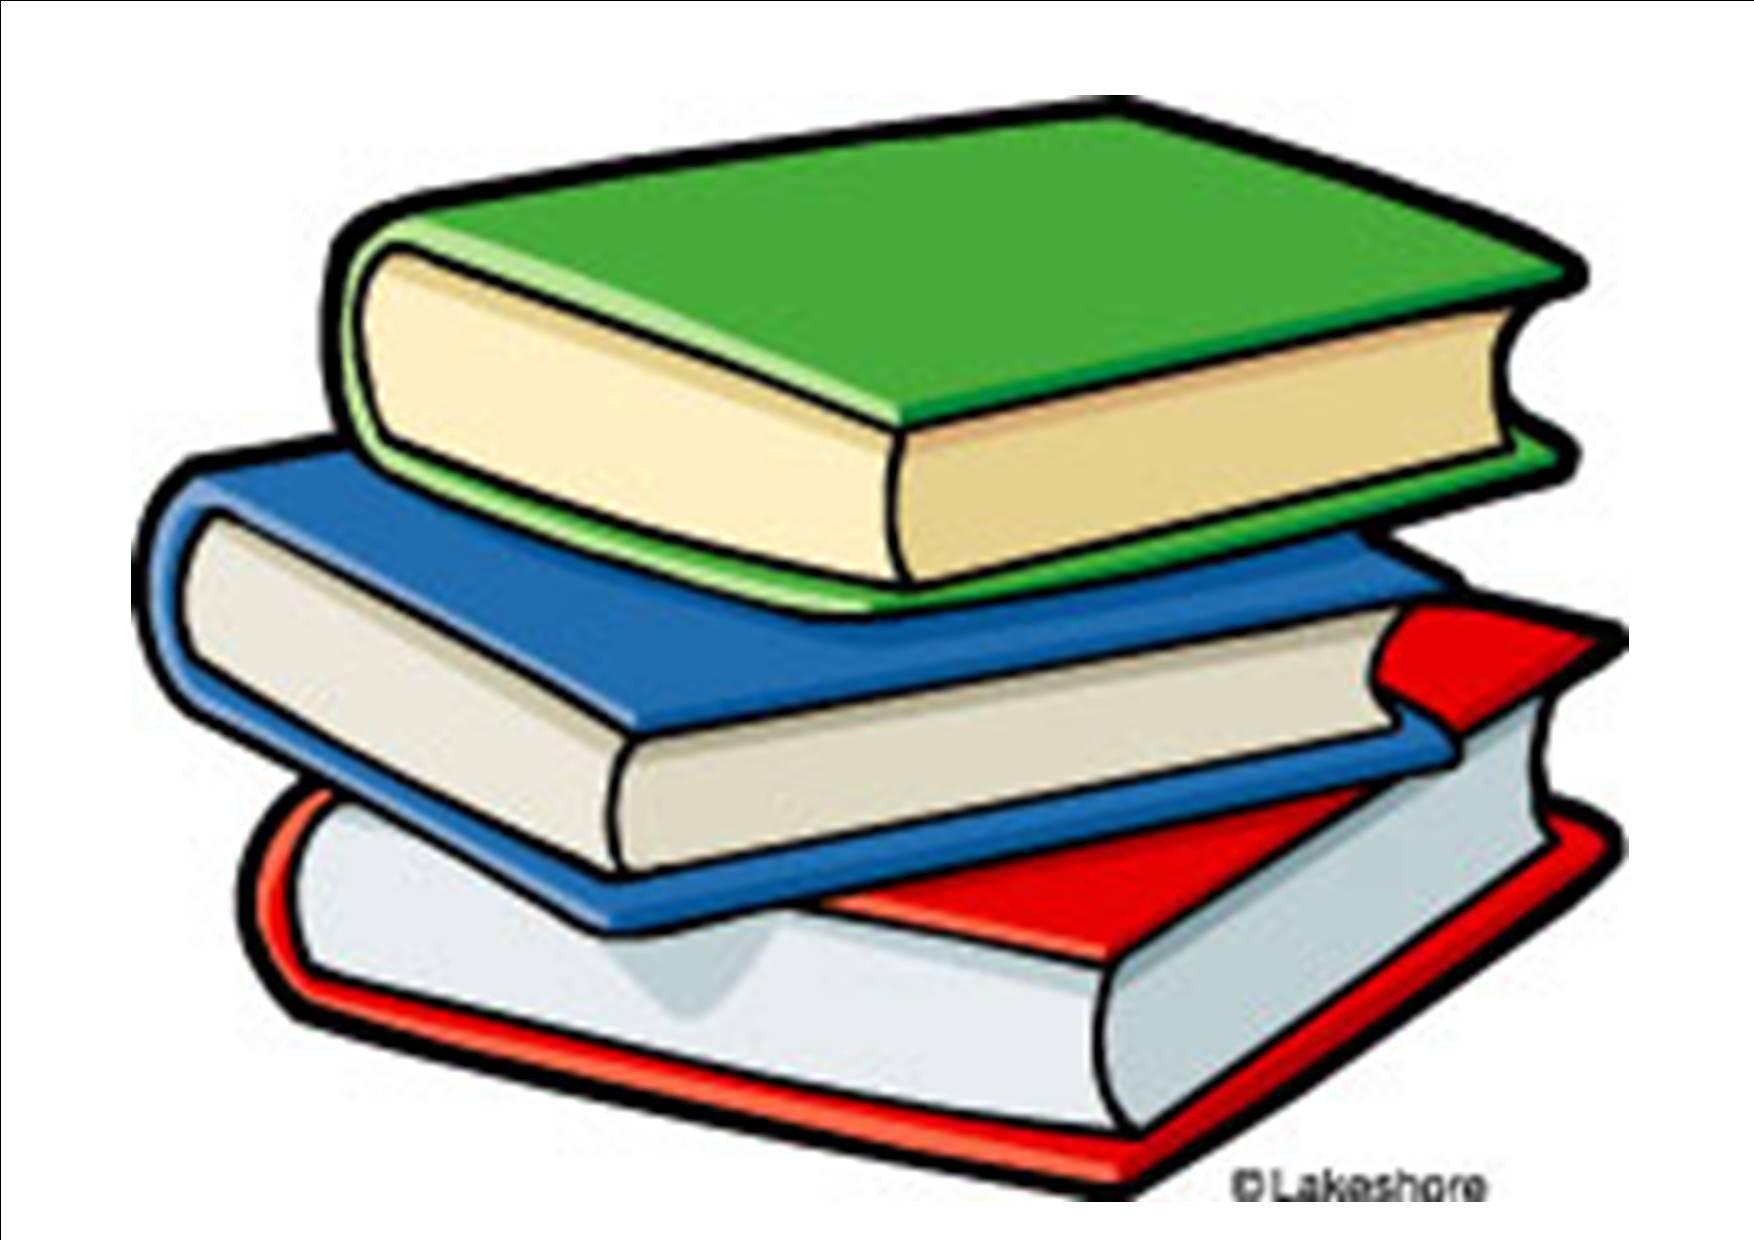 Books For Clip Art u0026middot; Clip Art-Books For Clip Art u0026middot; Clip Art-1